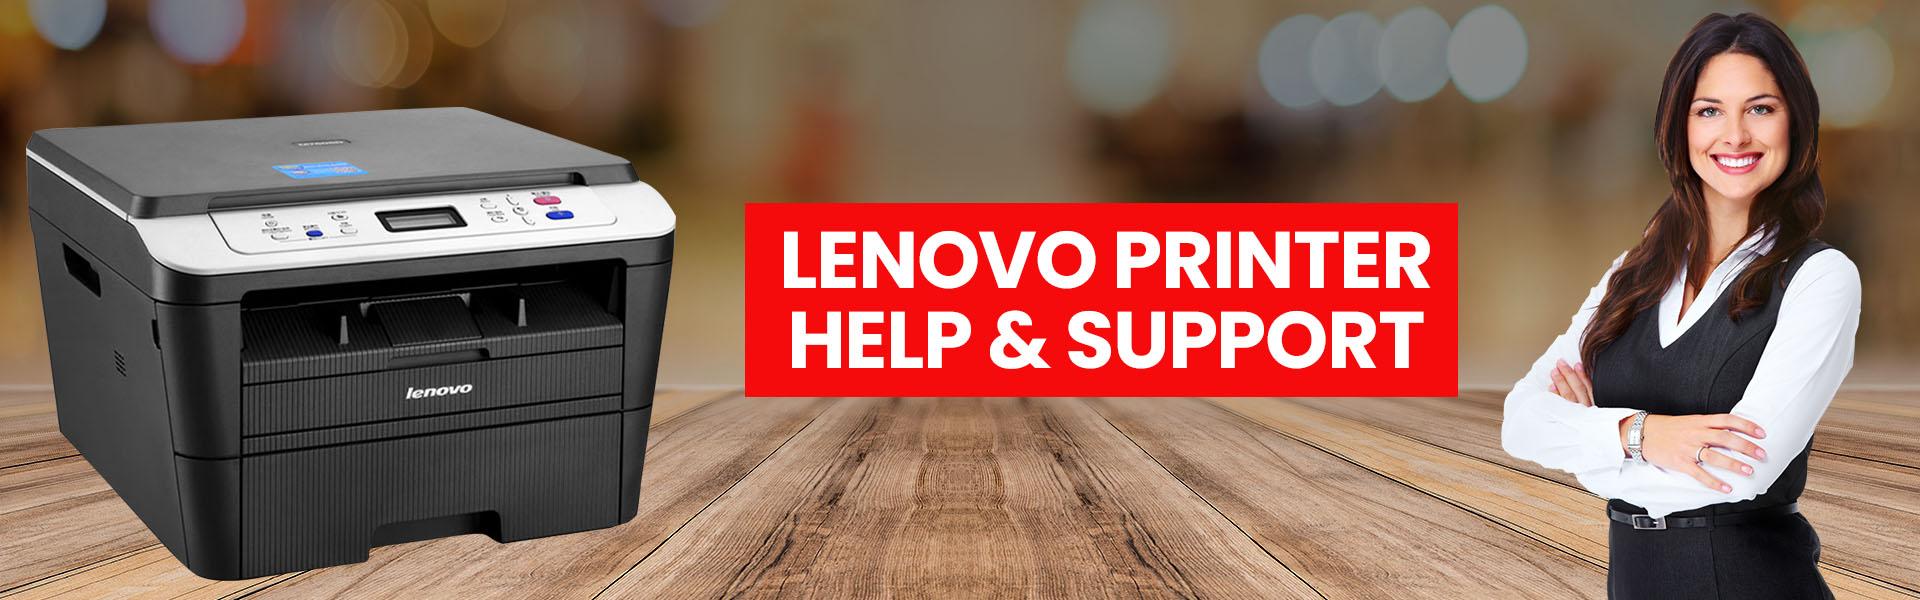 lenovo printer help support